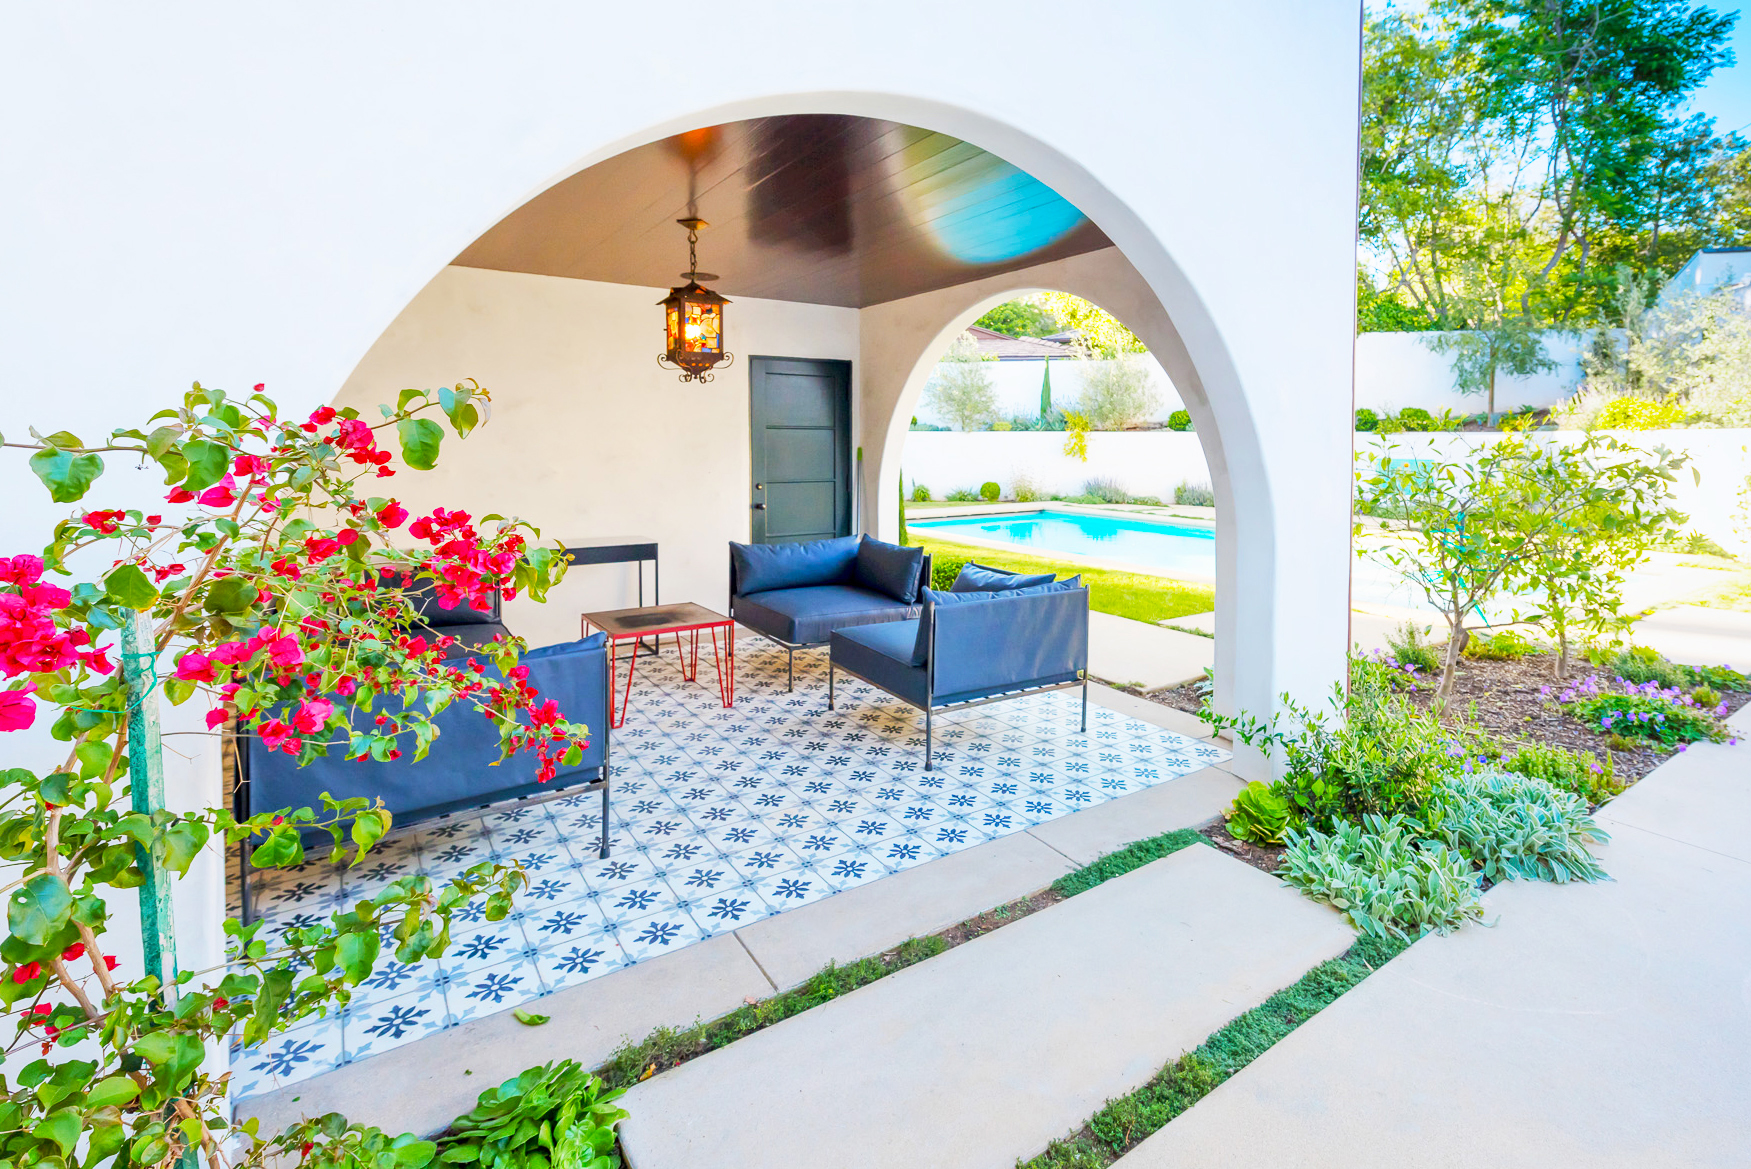 GRAYDONYEARICKARCHITECT.NEANDROSS.Tiled patio.jpg